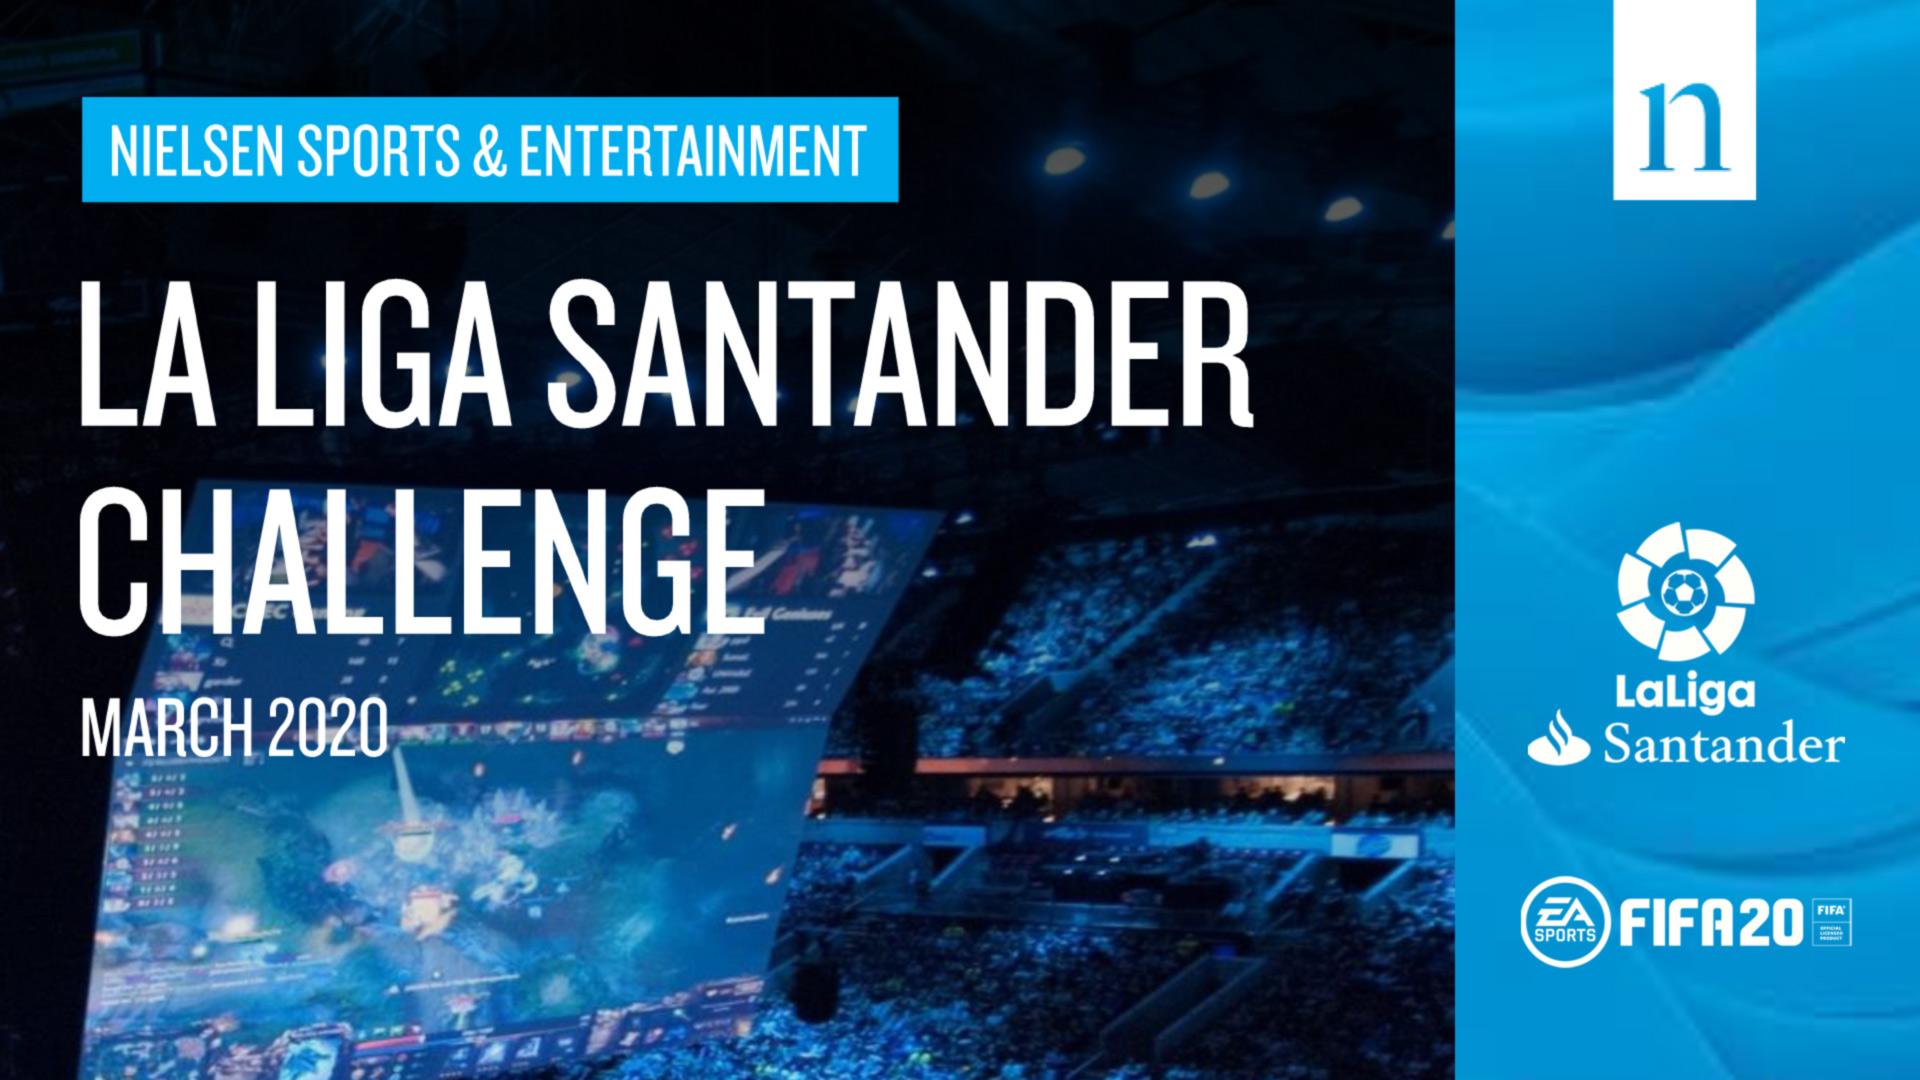 La Liga Santander Challenge 2020 - Media report